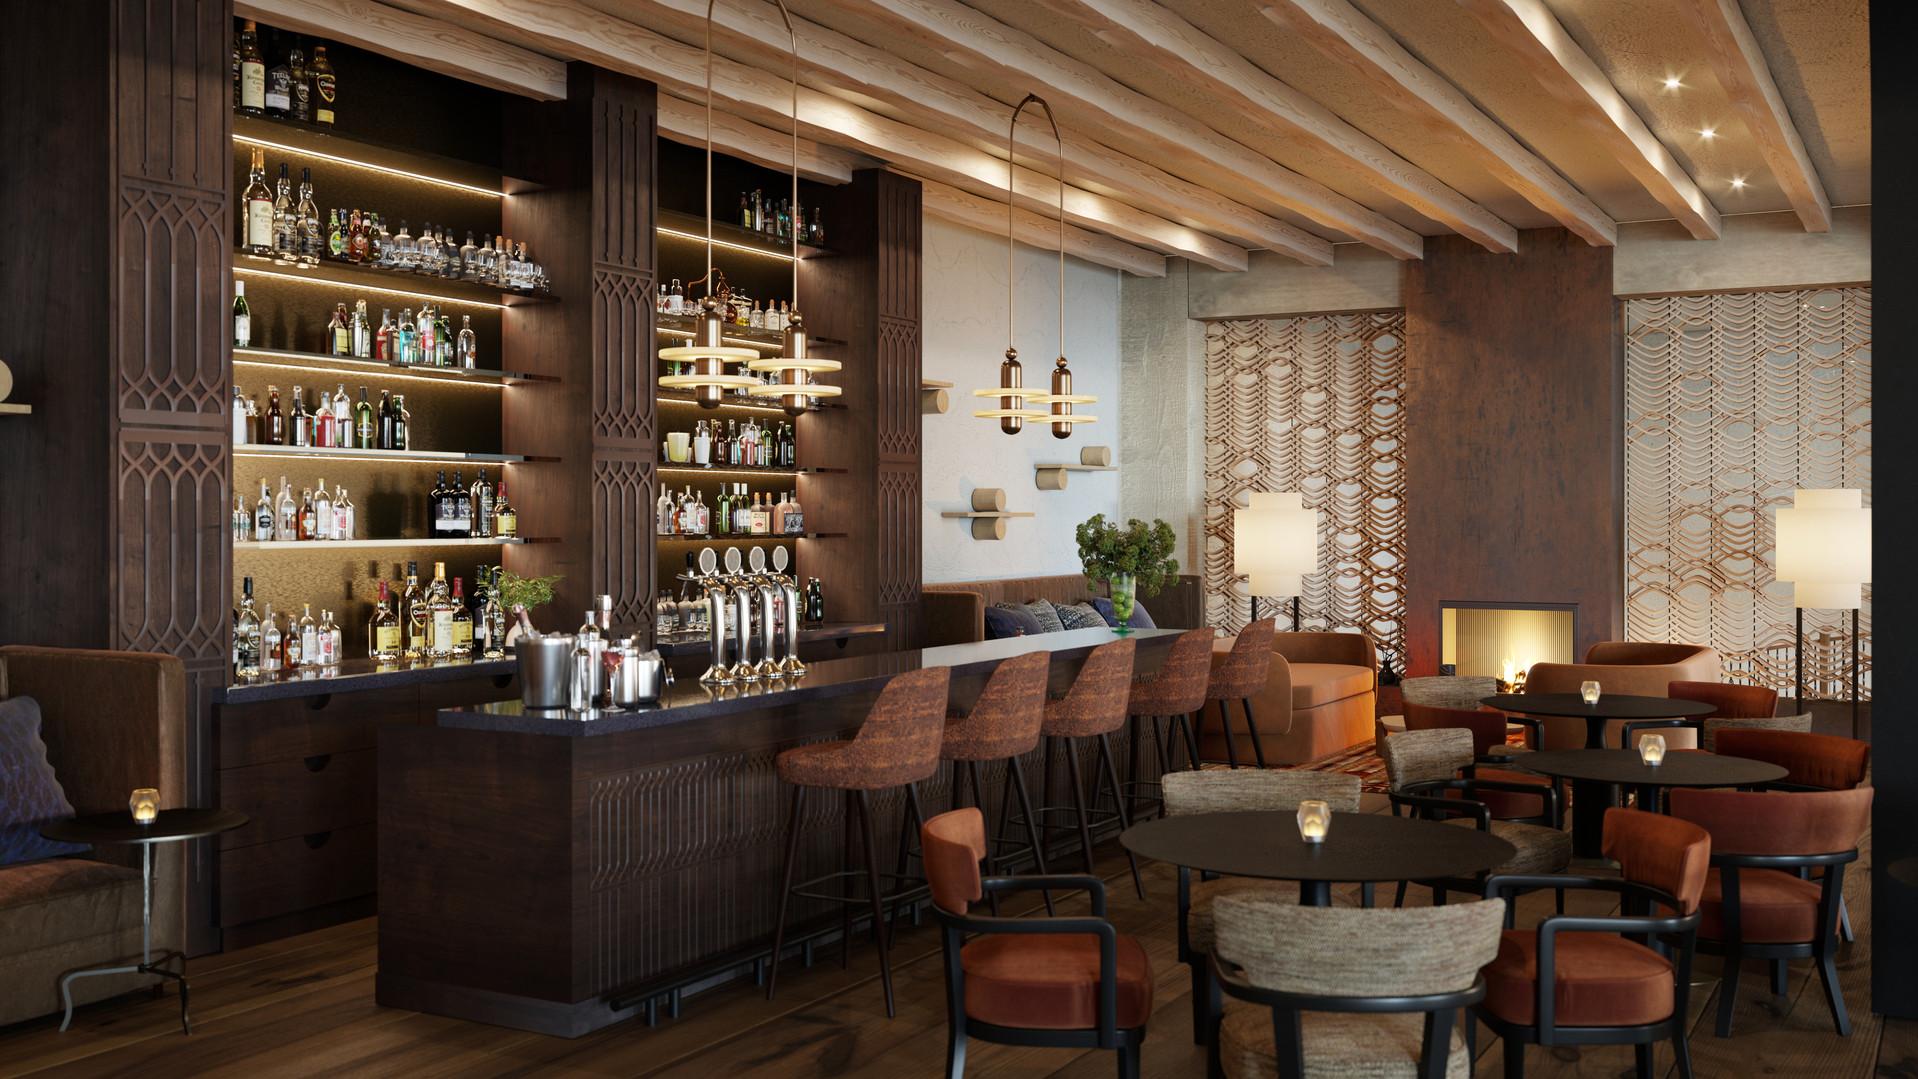 Radisson Blu Gudauri Lobby Bar.jpg